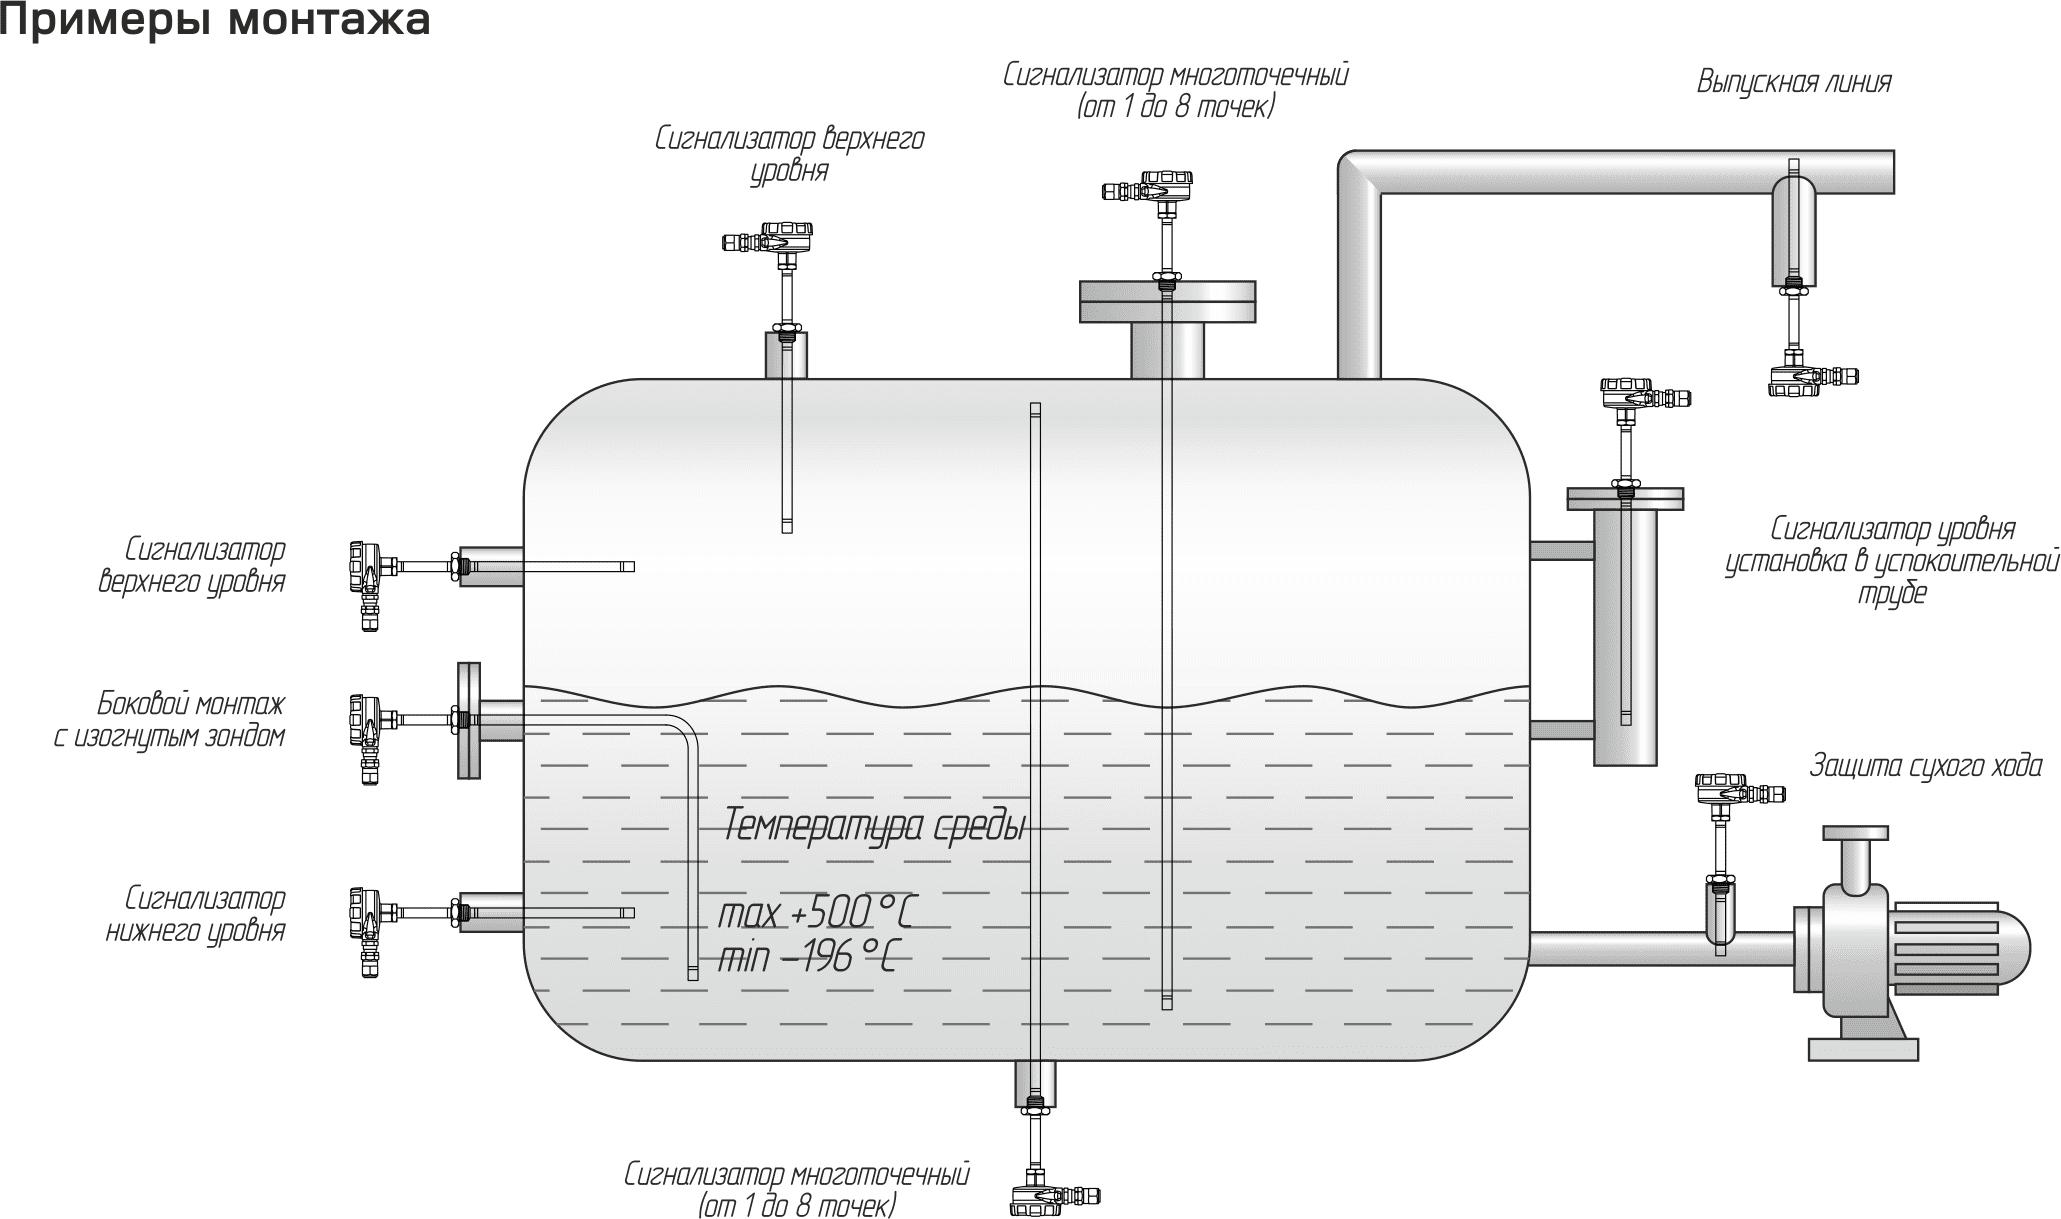 сигнализатор уровня жидкости цена